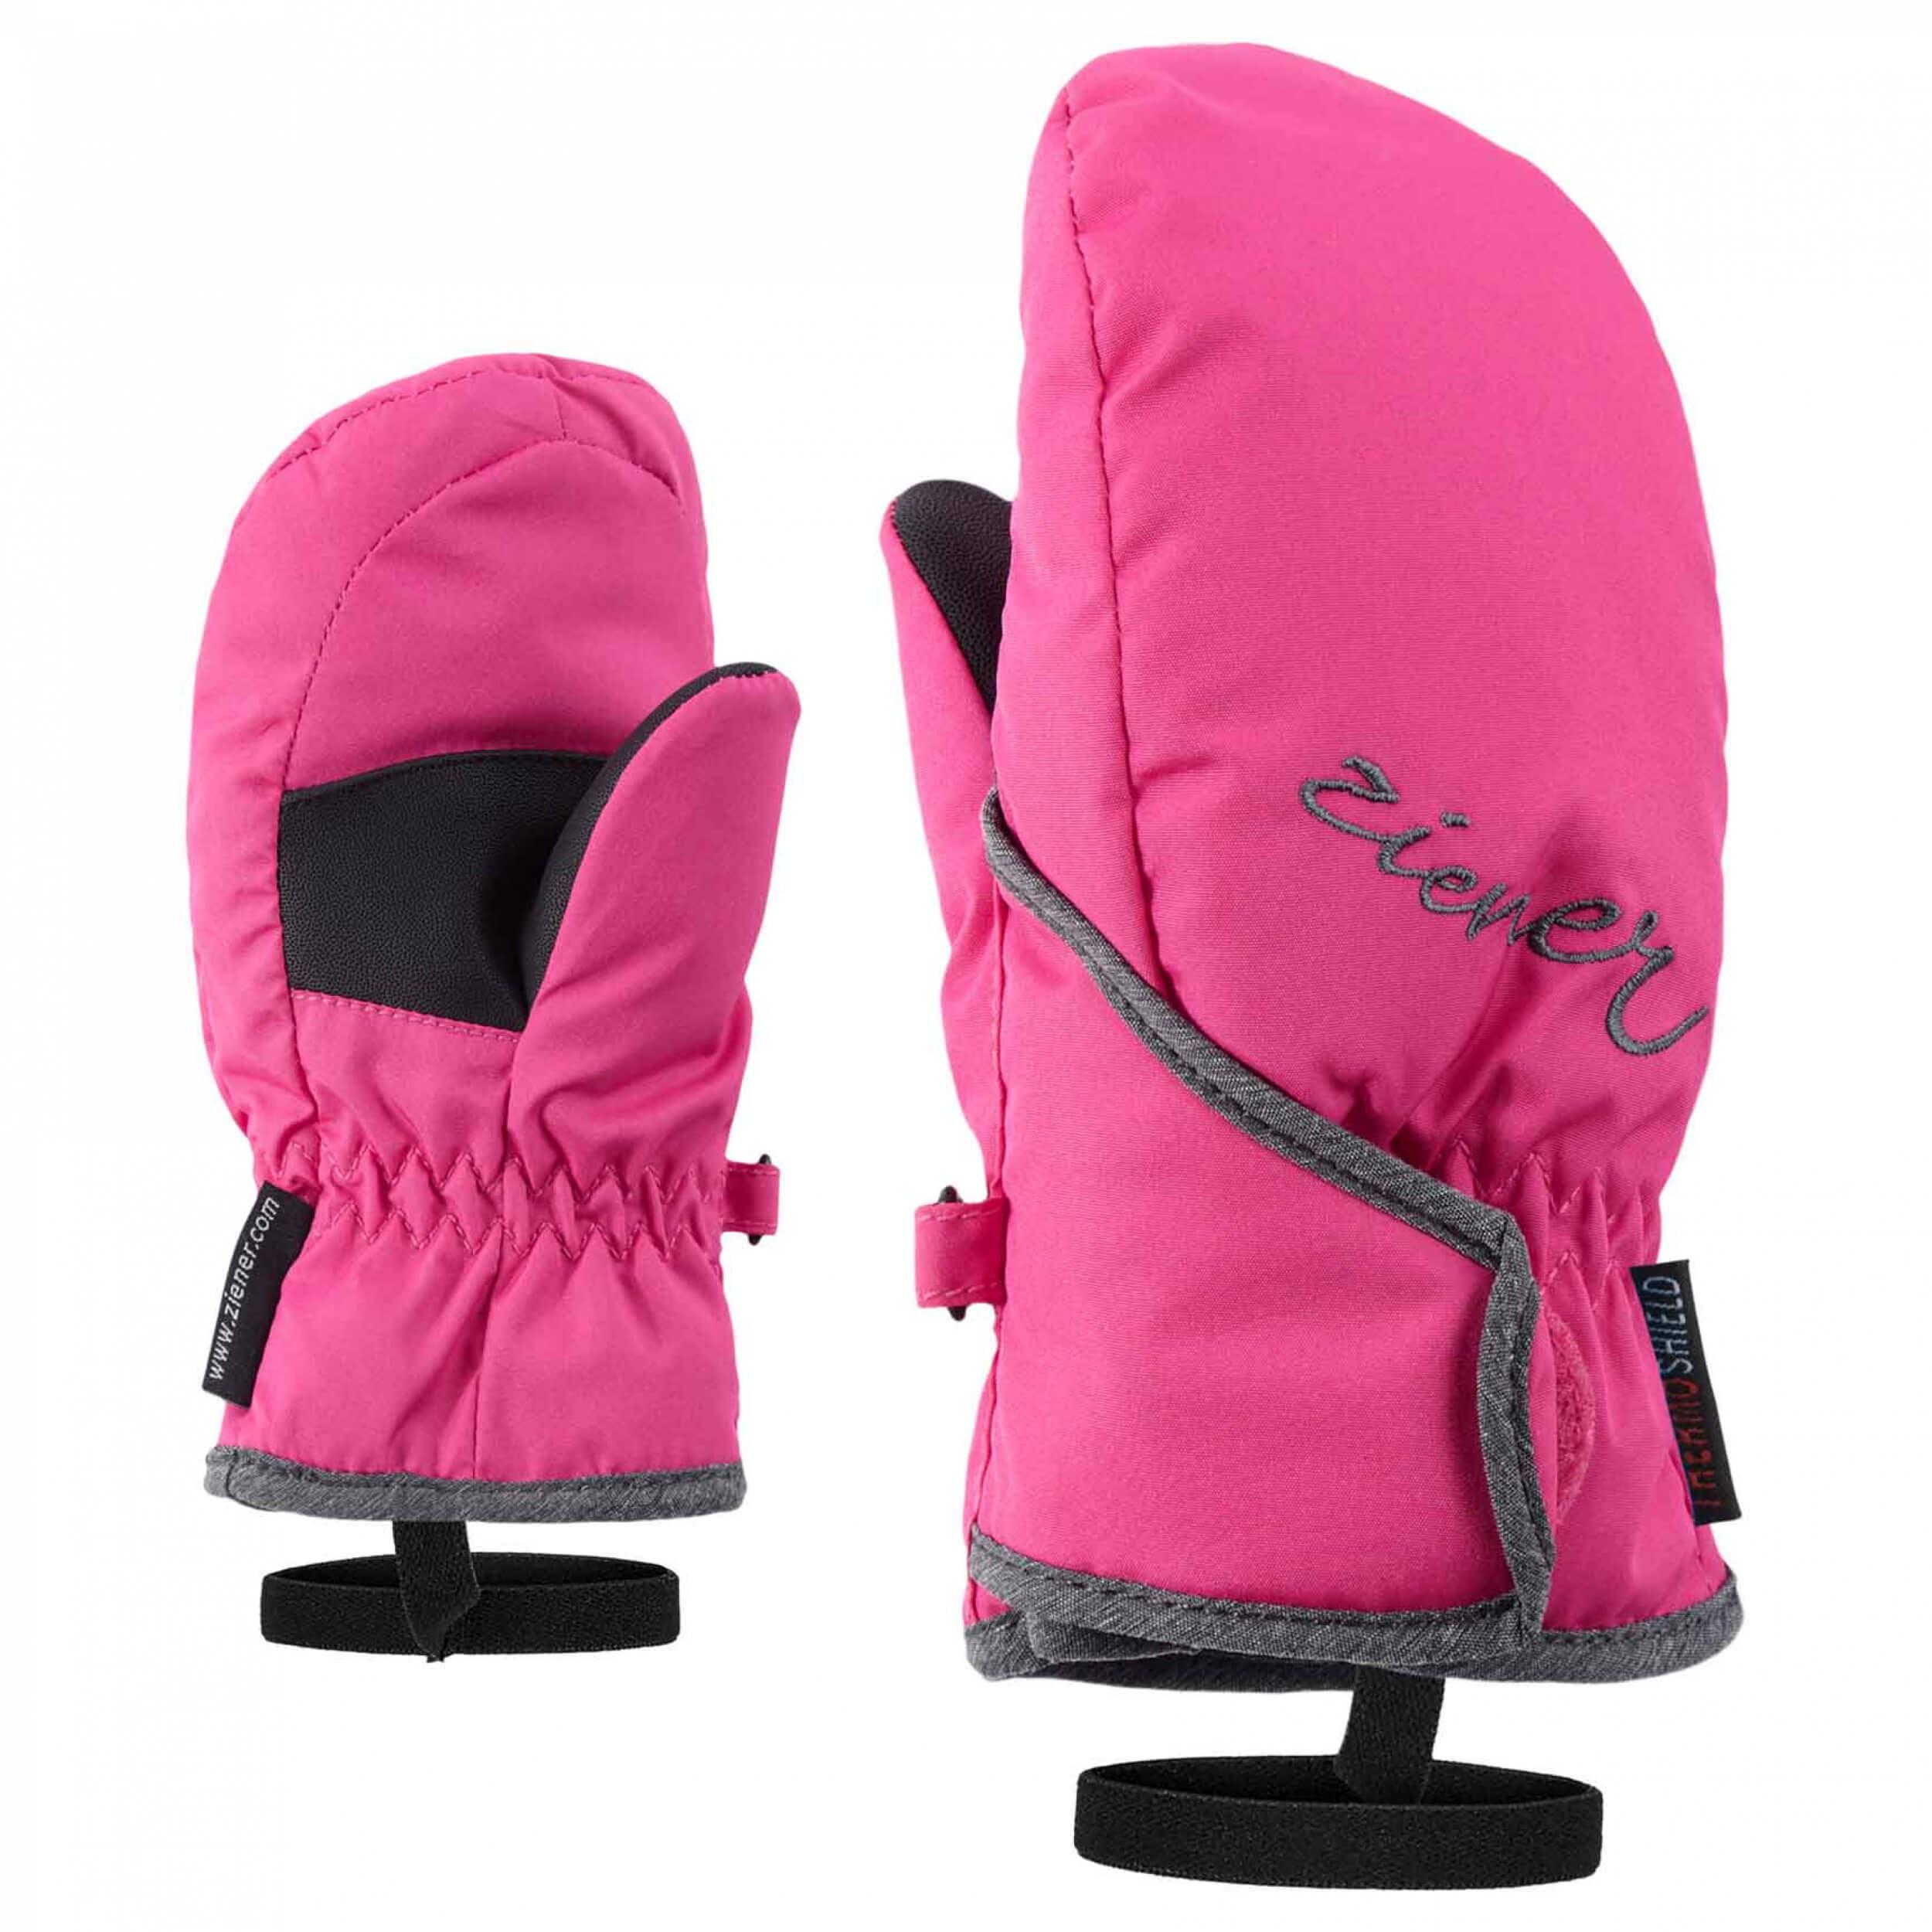 ZIENER Kinder Mini Fäustlinge AQUASHIELD Lollo pink grau 766822